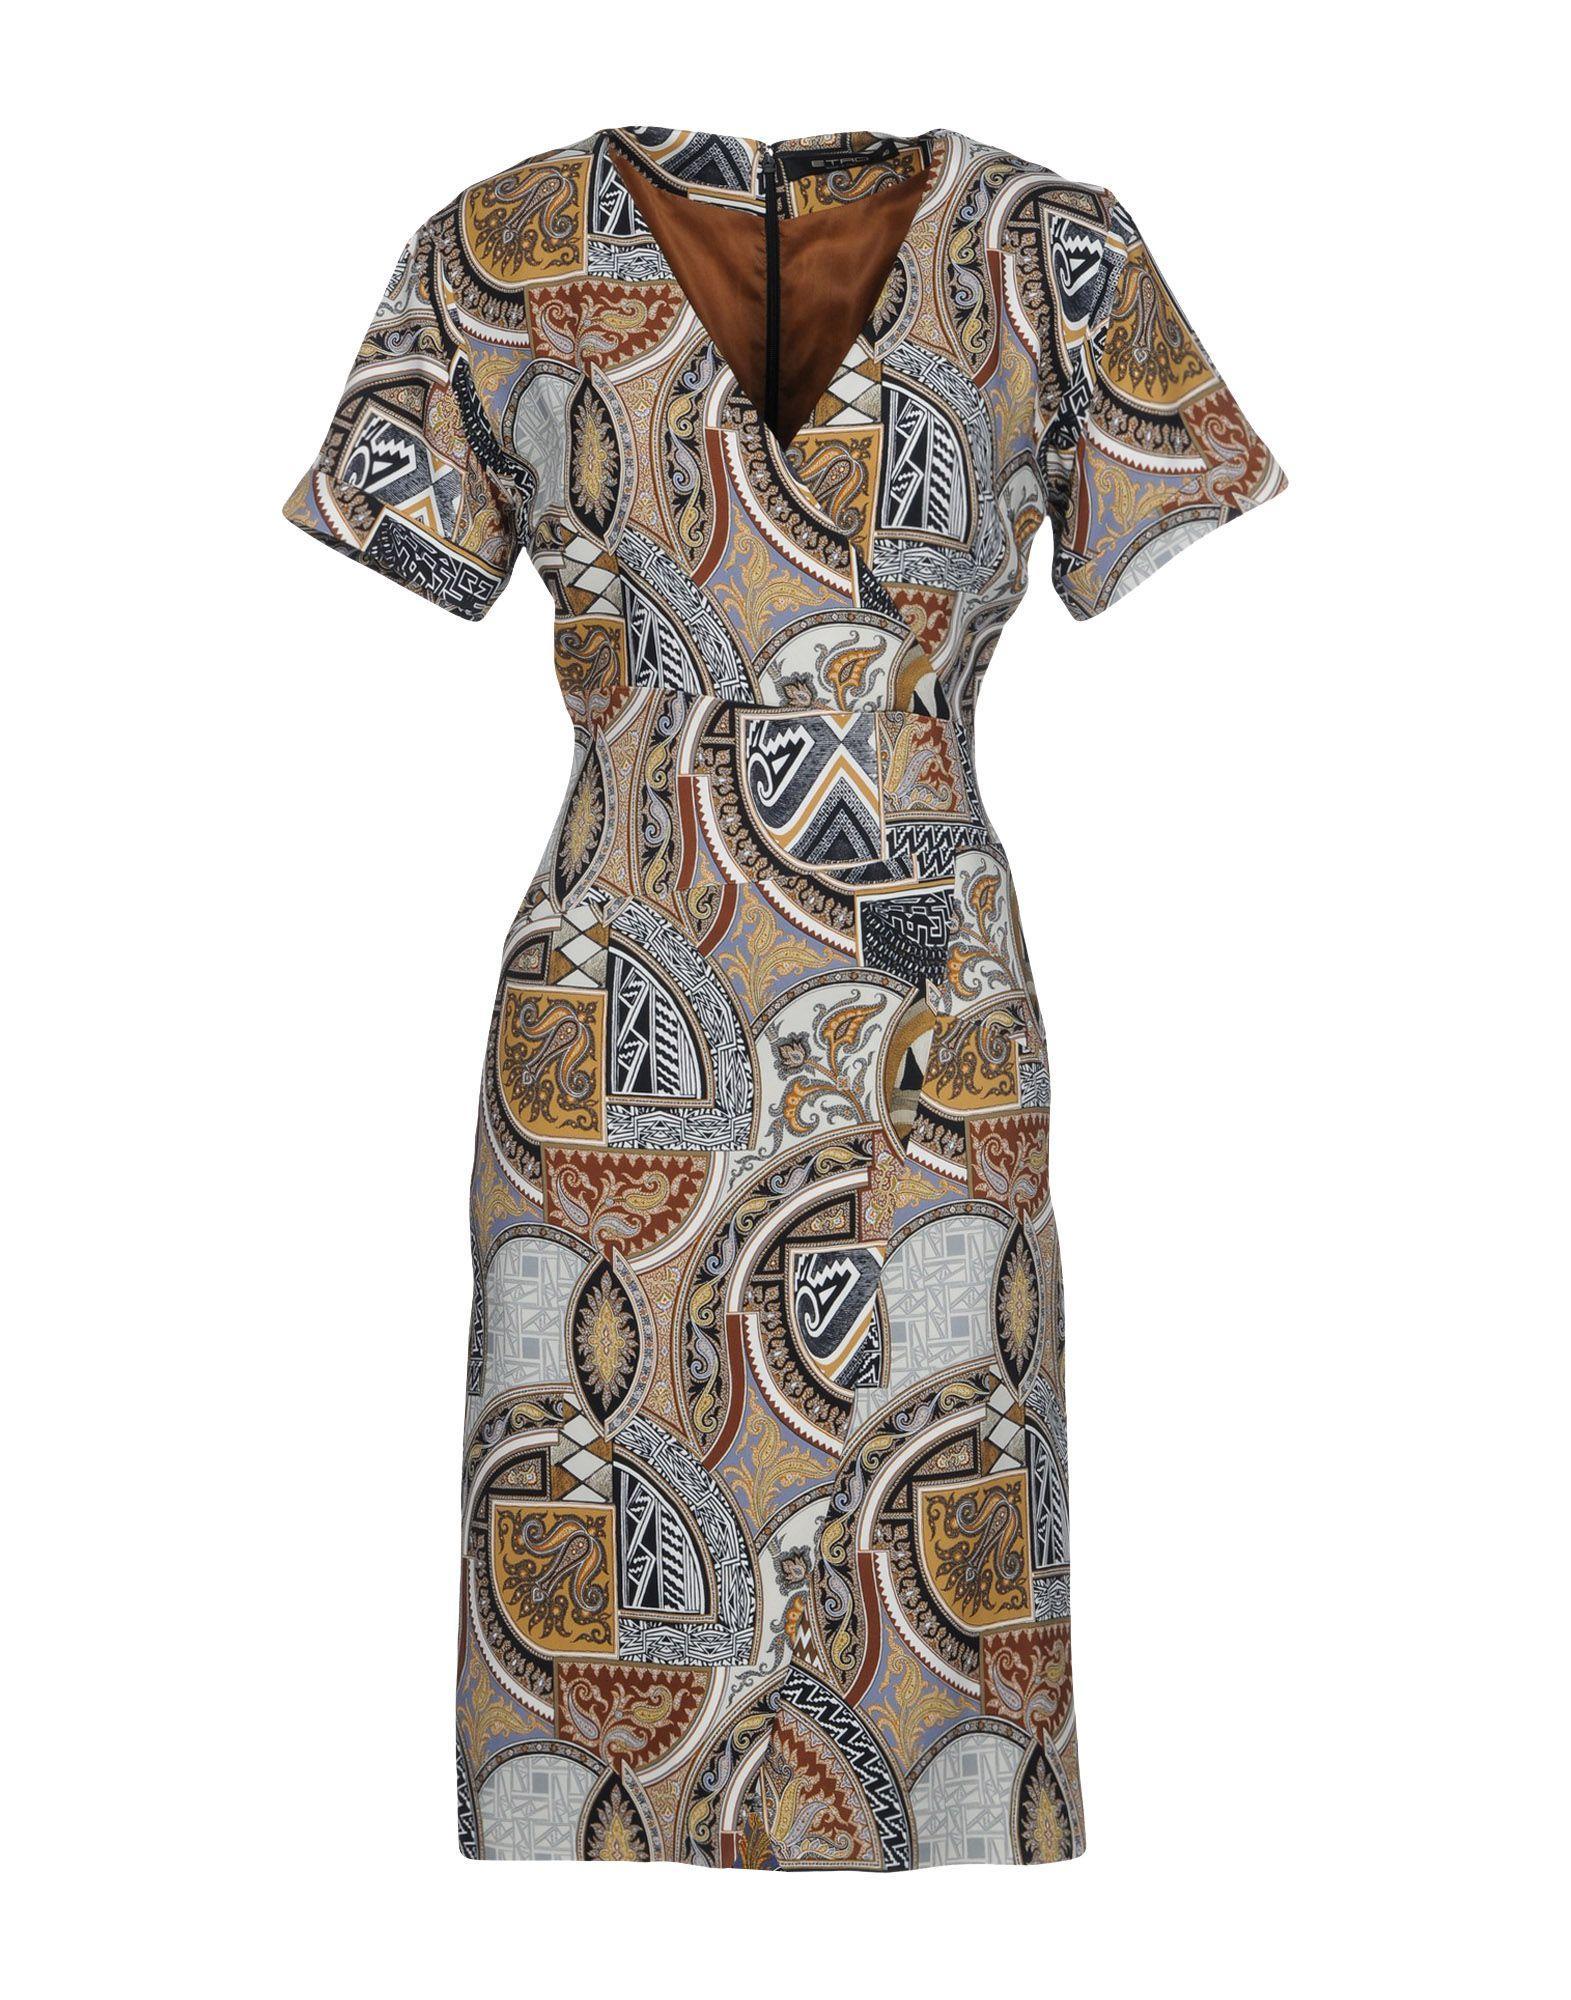 Etro Knee-length Dress In Brown